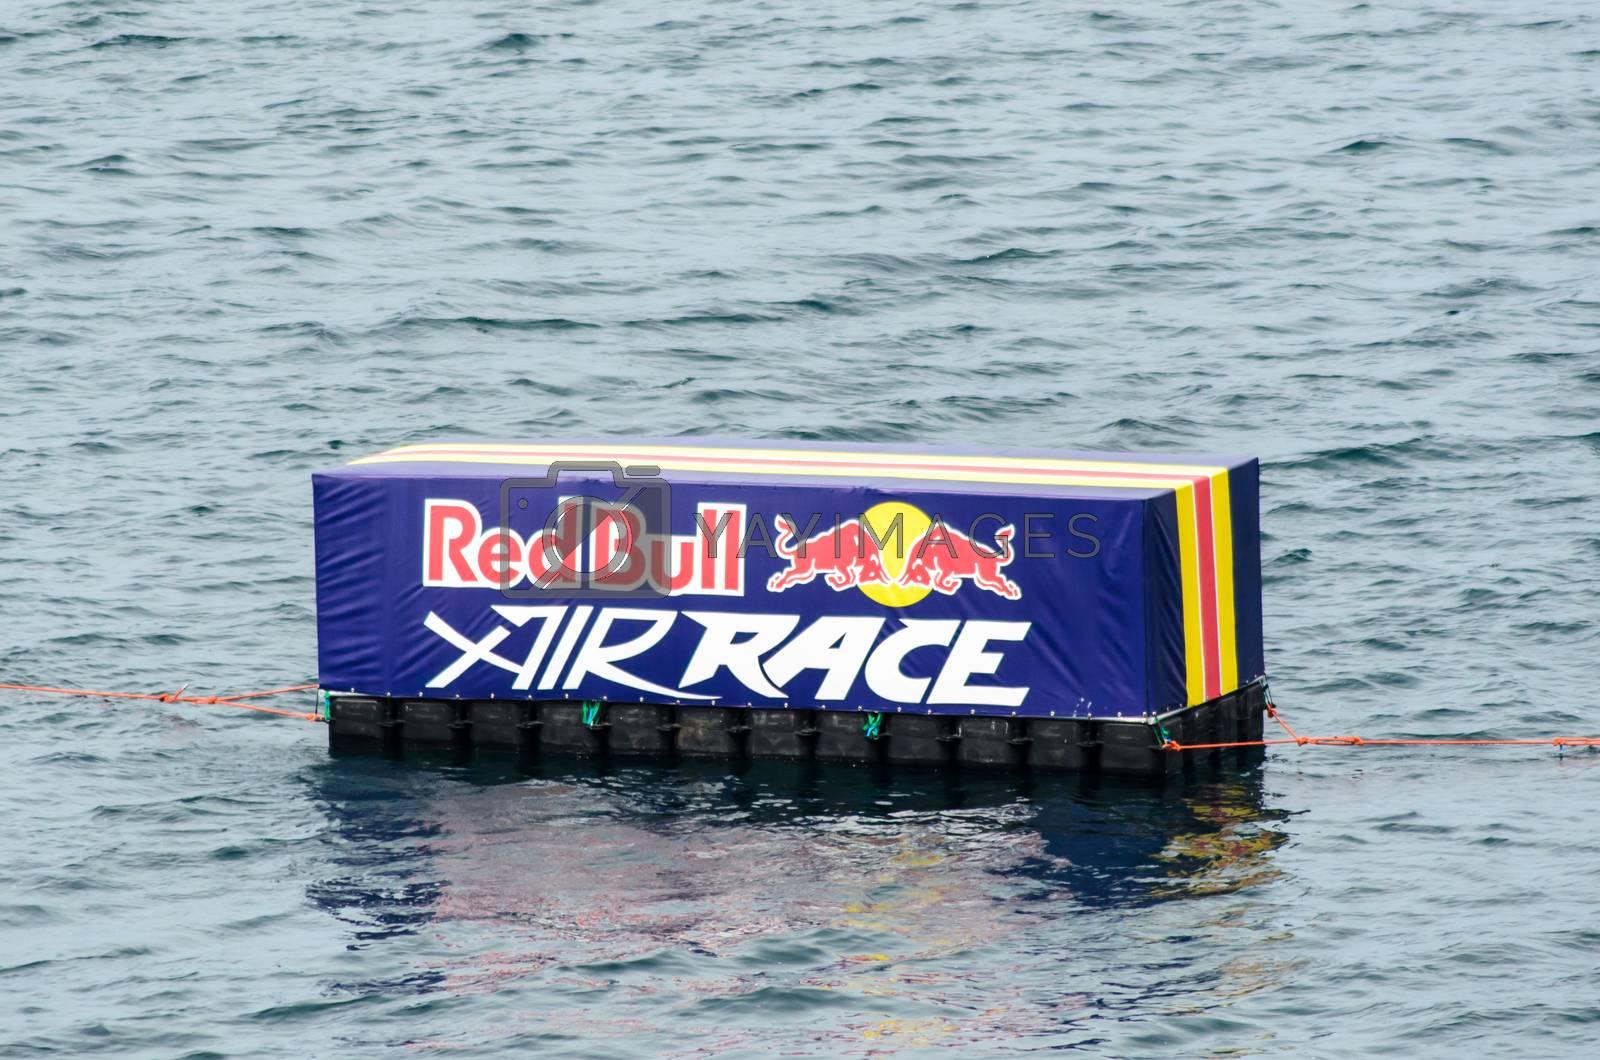 ROVINJ, CROATIA - APRIL 13 2014 at Red Bull Air Race event by vepar5